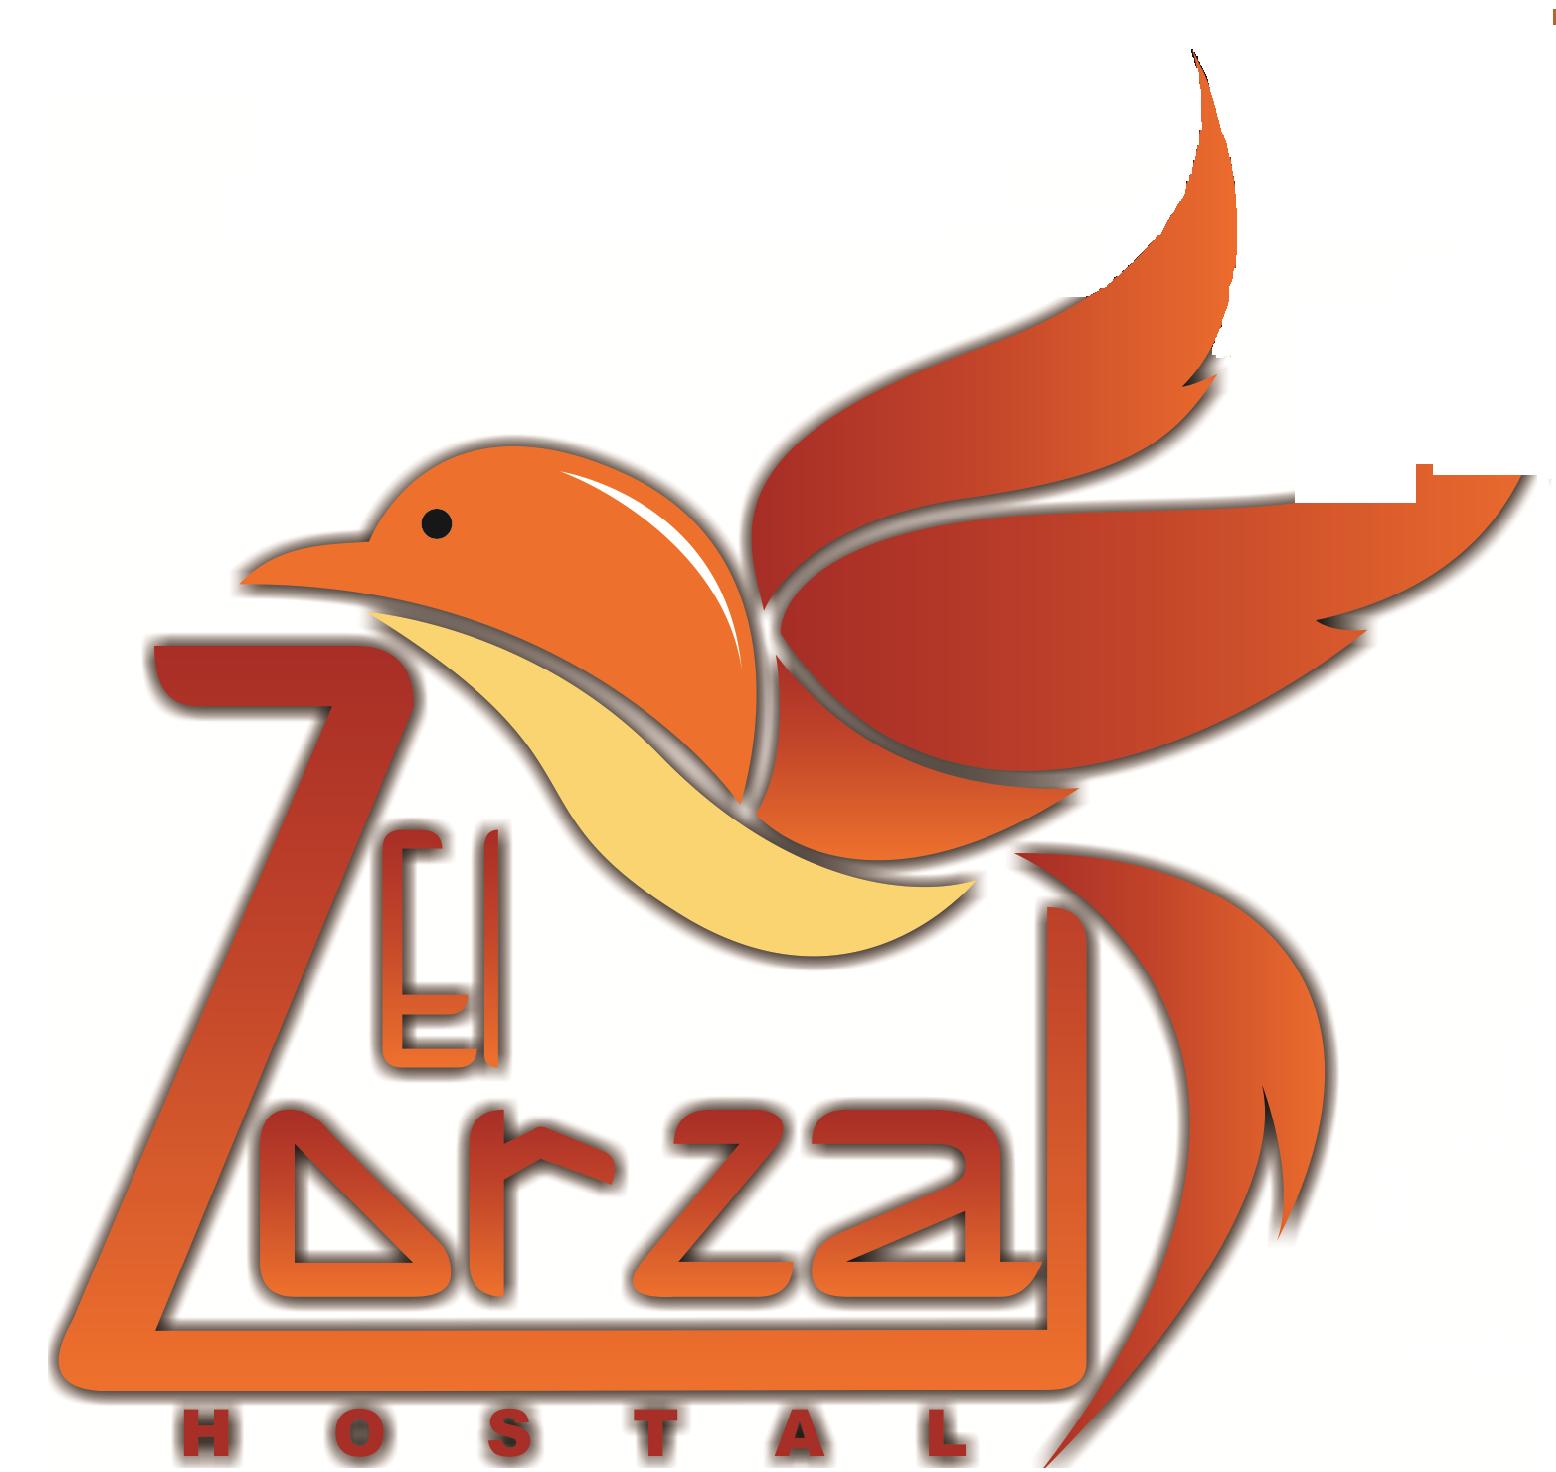 Hostal El Zorzal